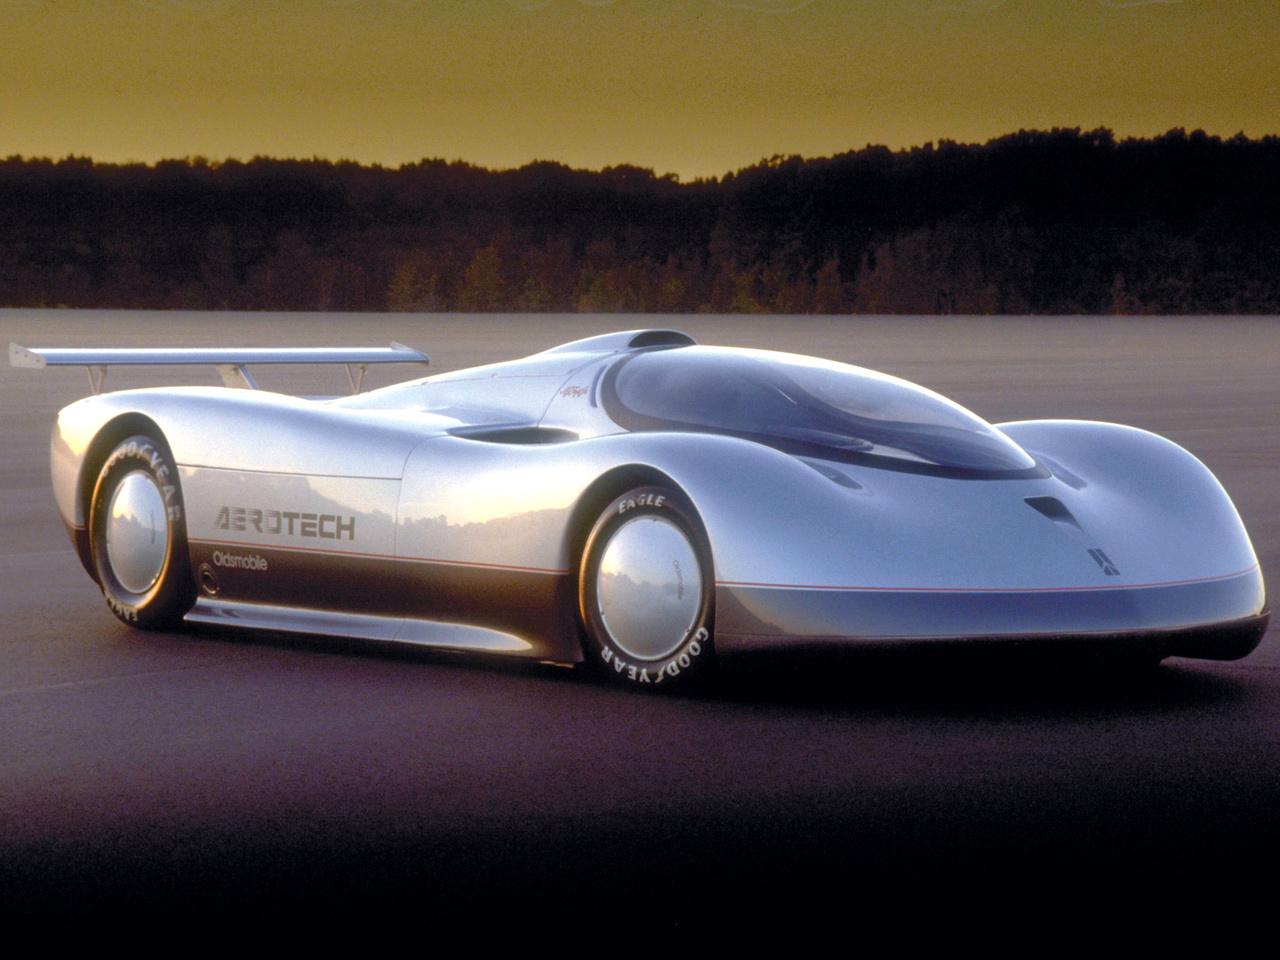 oldsmobile_aerotech_concept_4